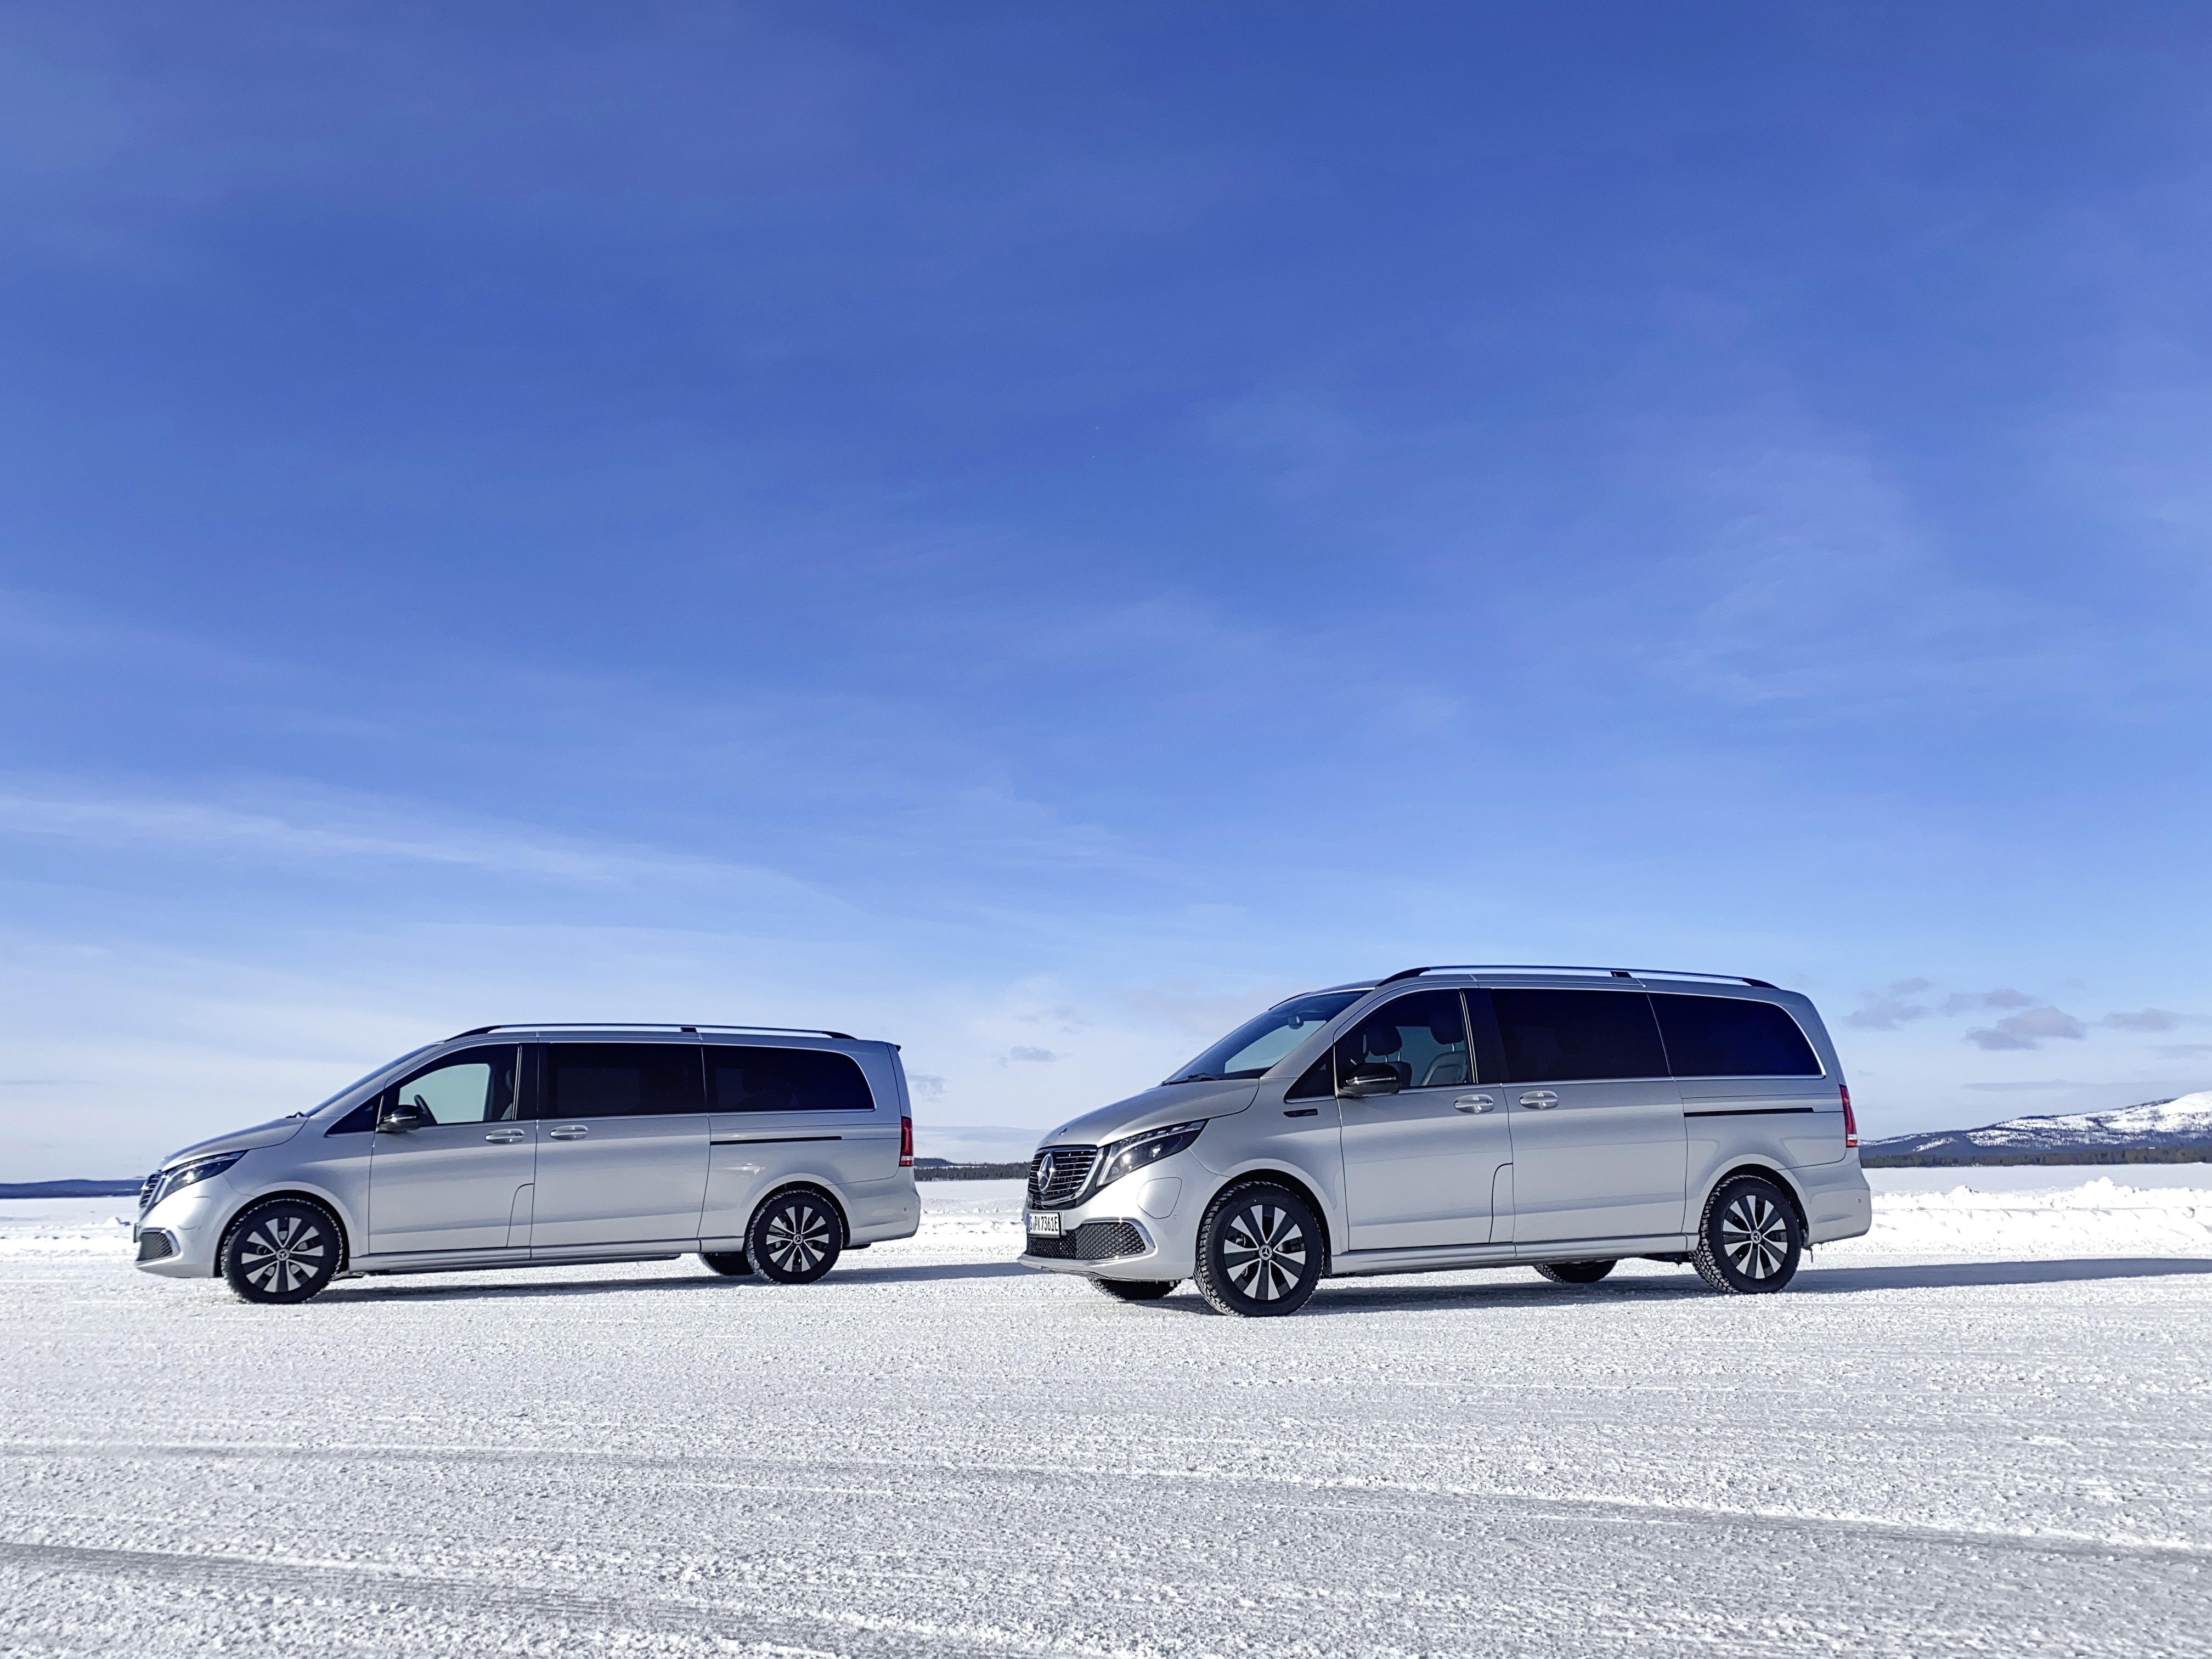 Mercedes-Benz 8-sitsiga elbil vintertestad i Sverige